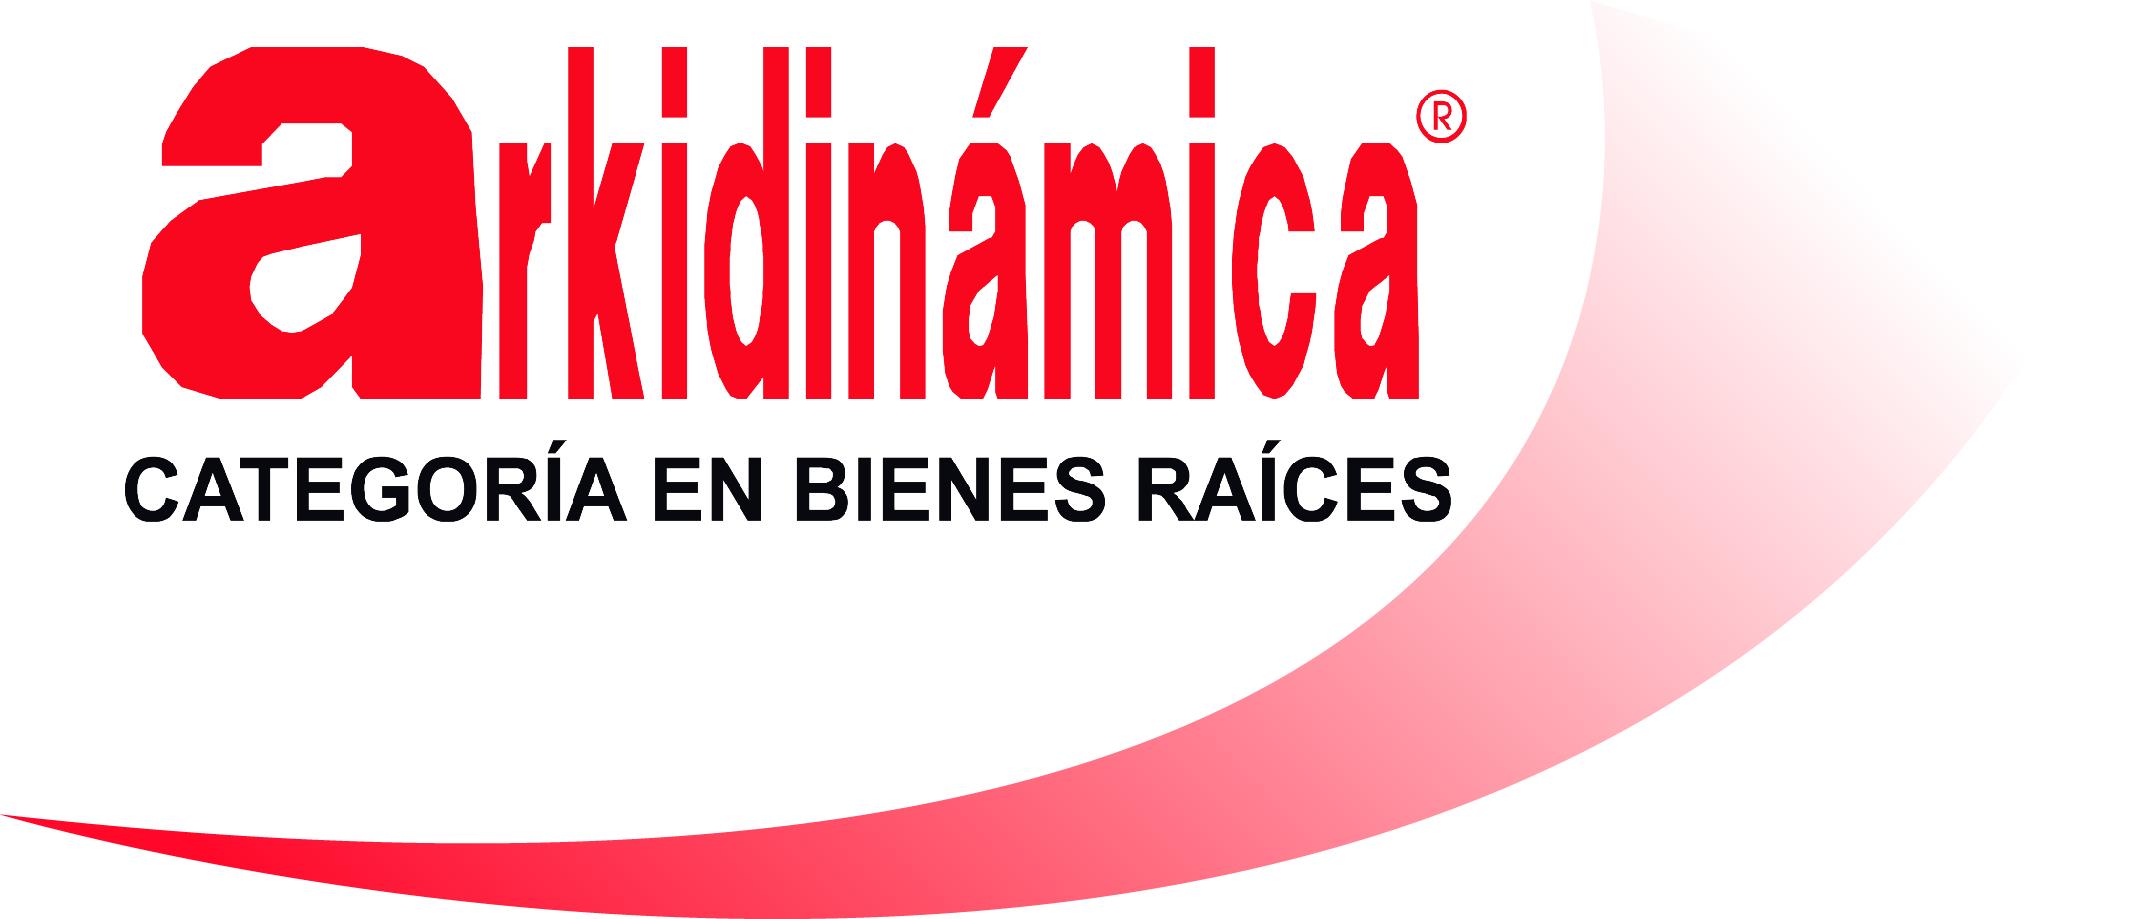 Formato_Arkidinamica.jpg